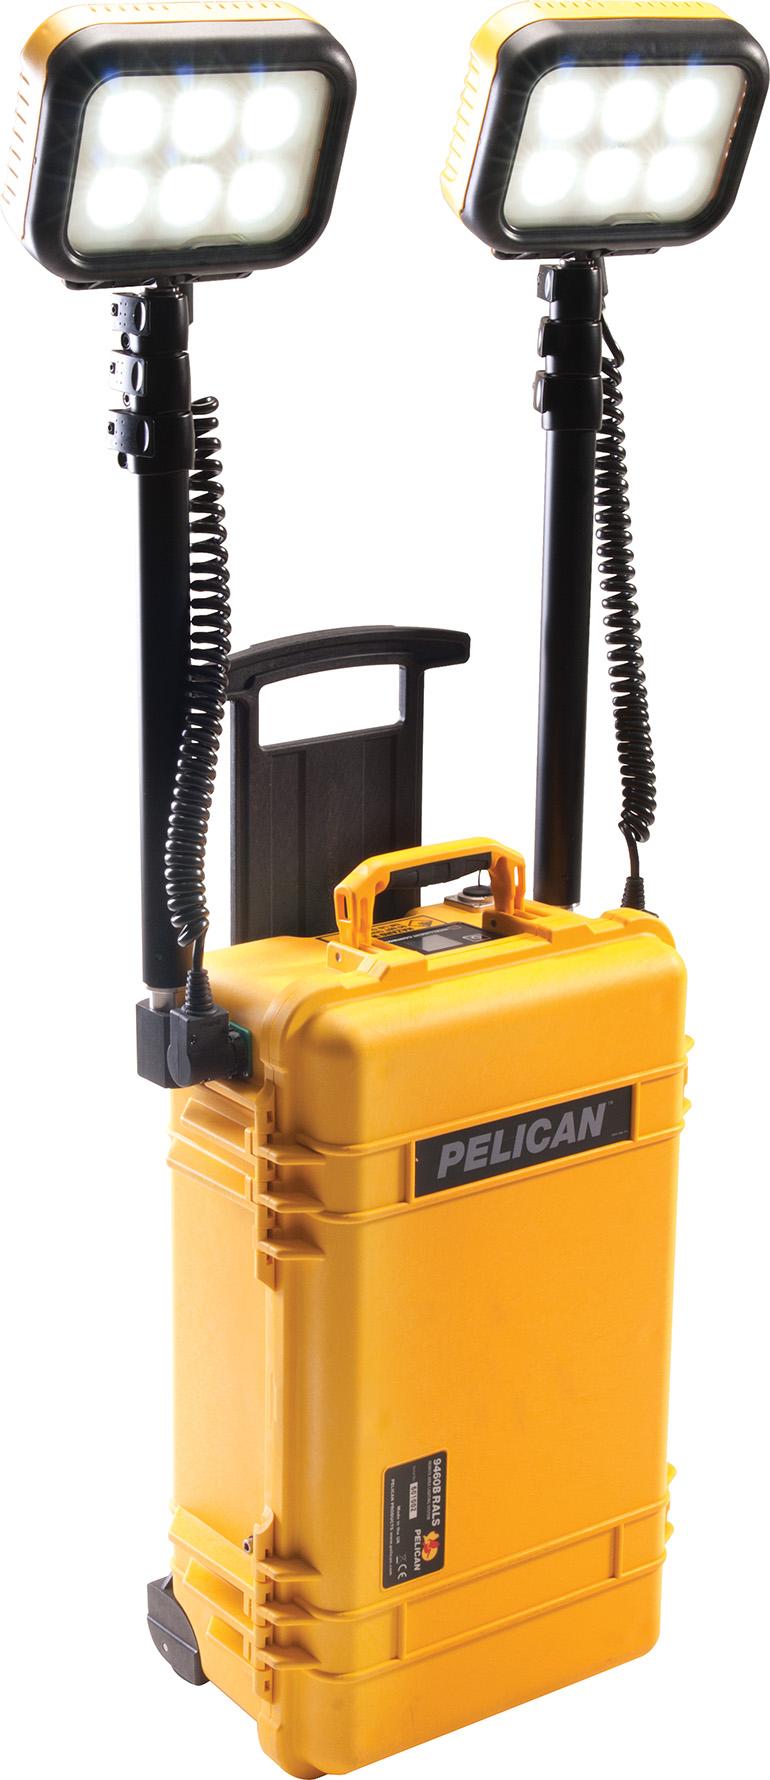 pelican-9460-remote-area-light